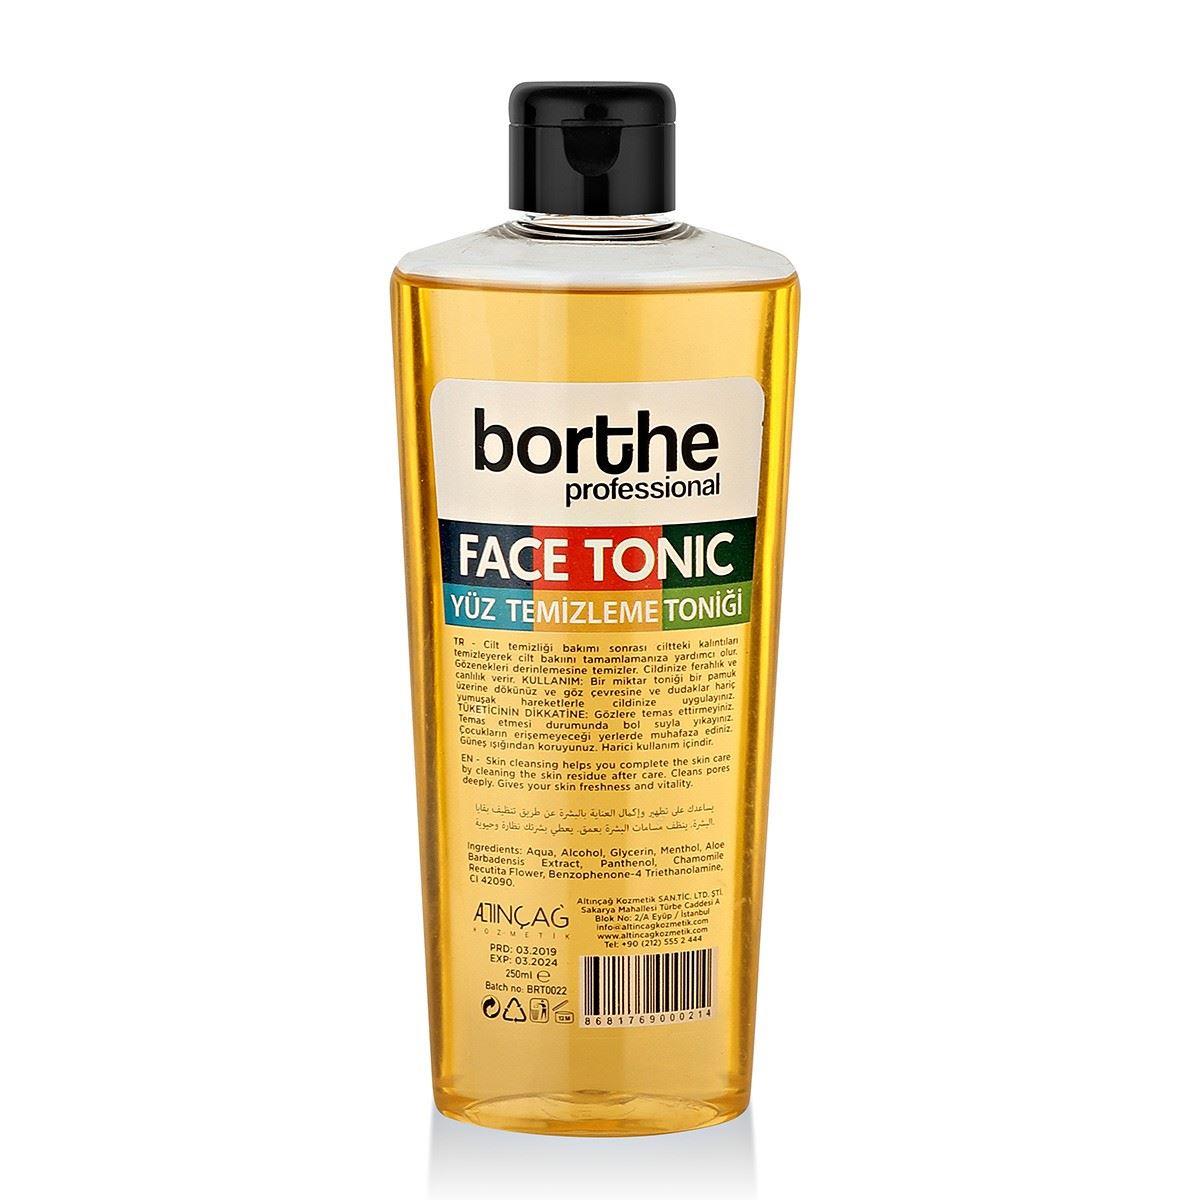 Borthe Sarı Yüz Toniği 250 ml.